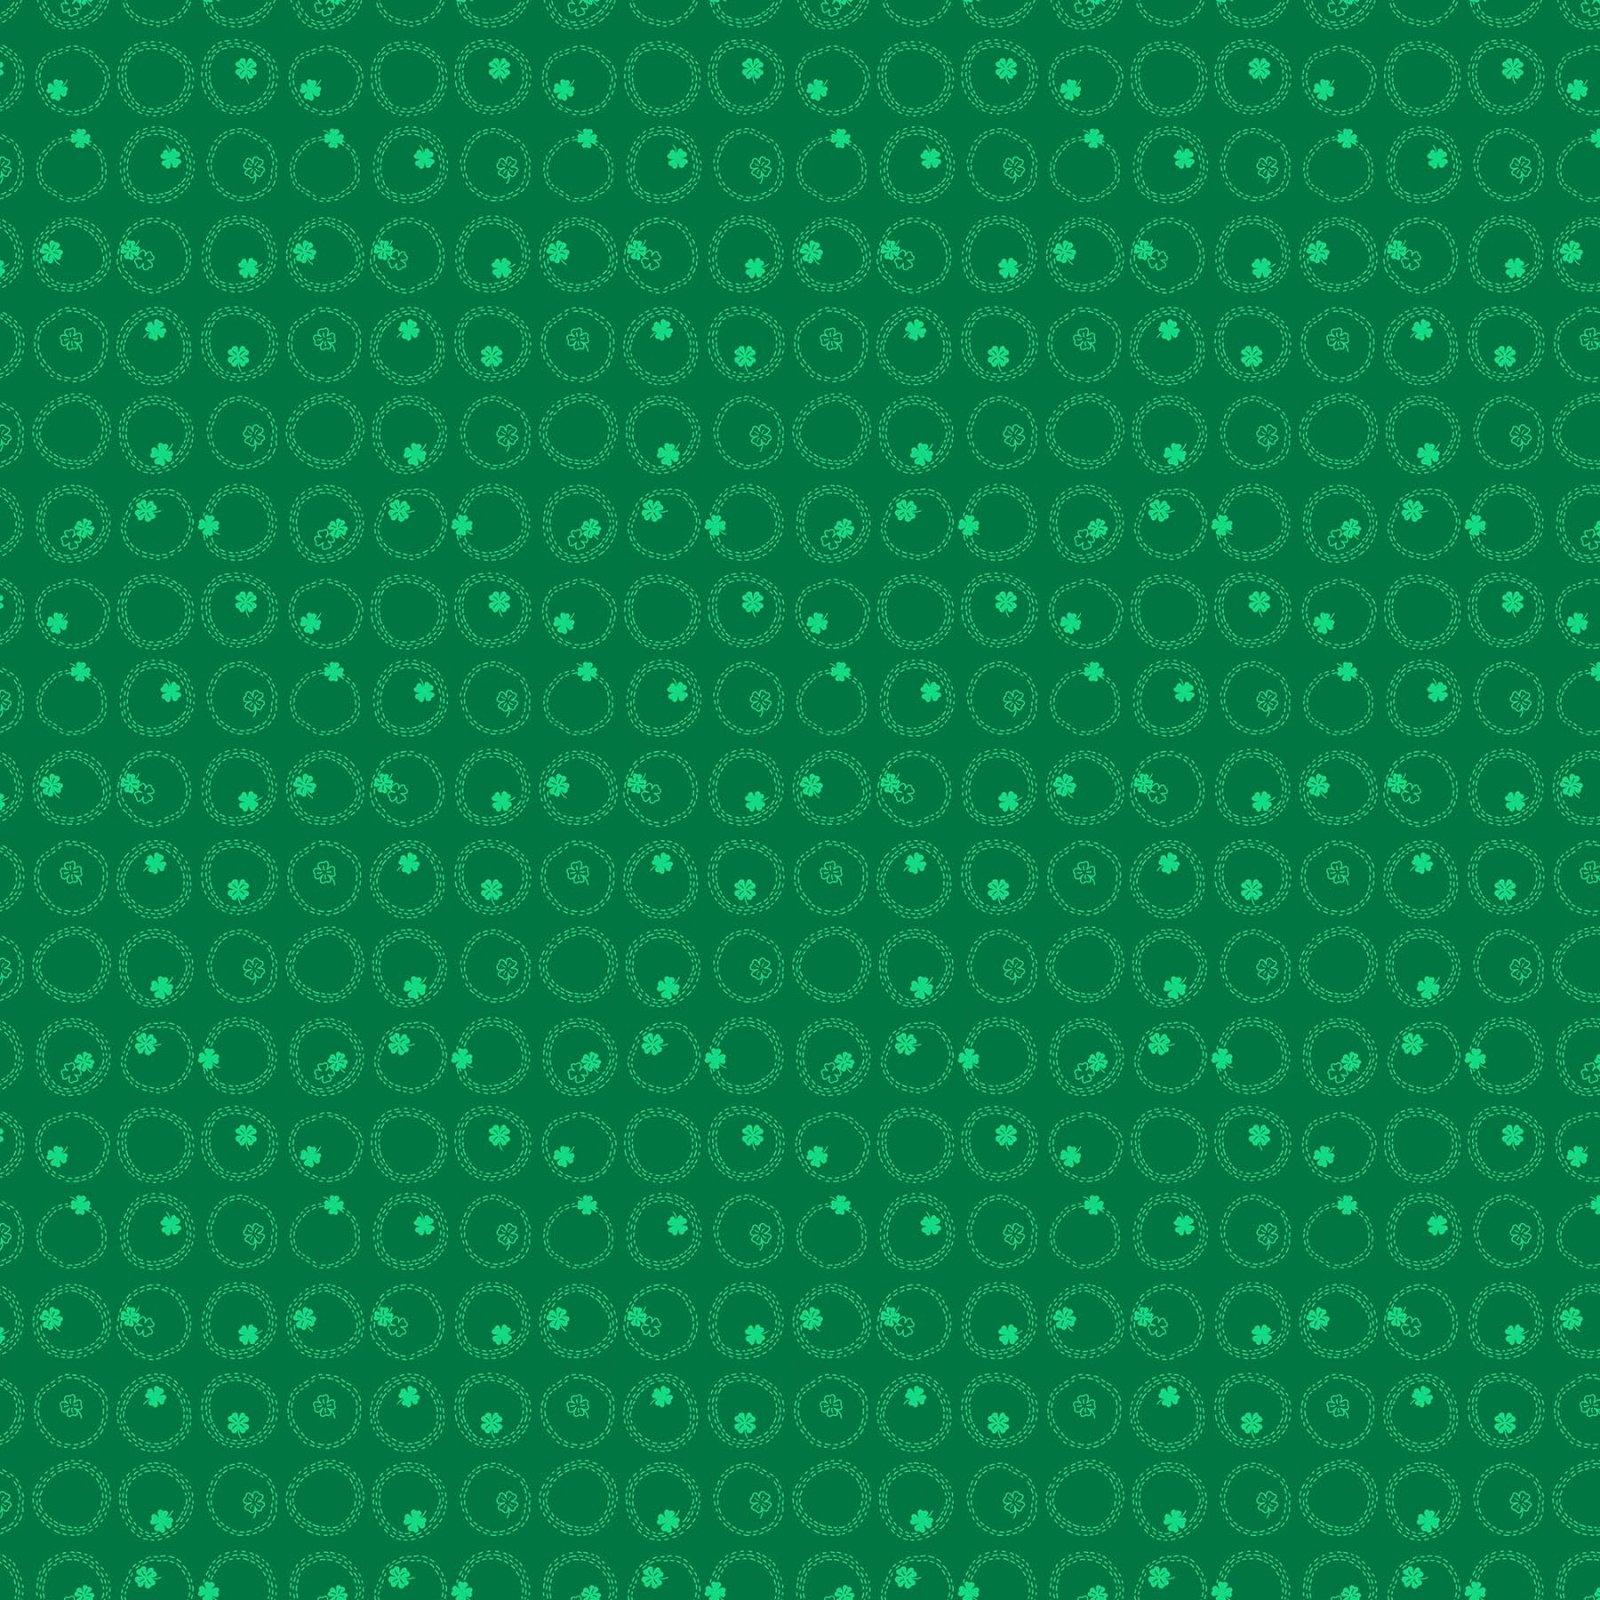 FIGO Fabrics LUCKY CHARMS BASICS - Clover